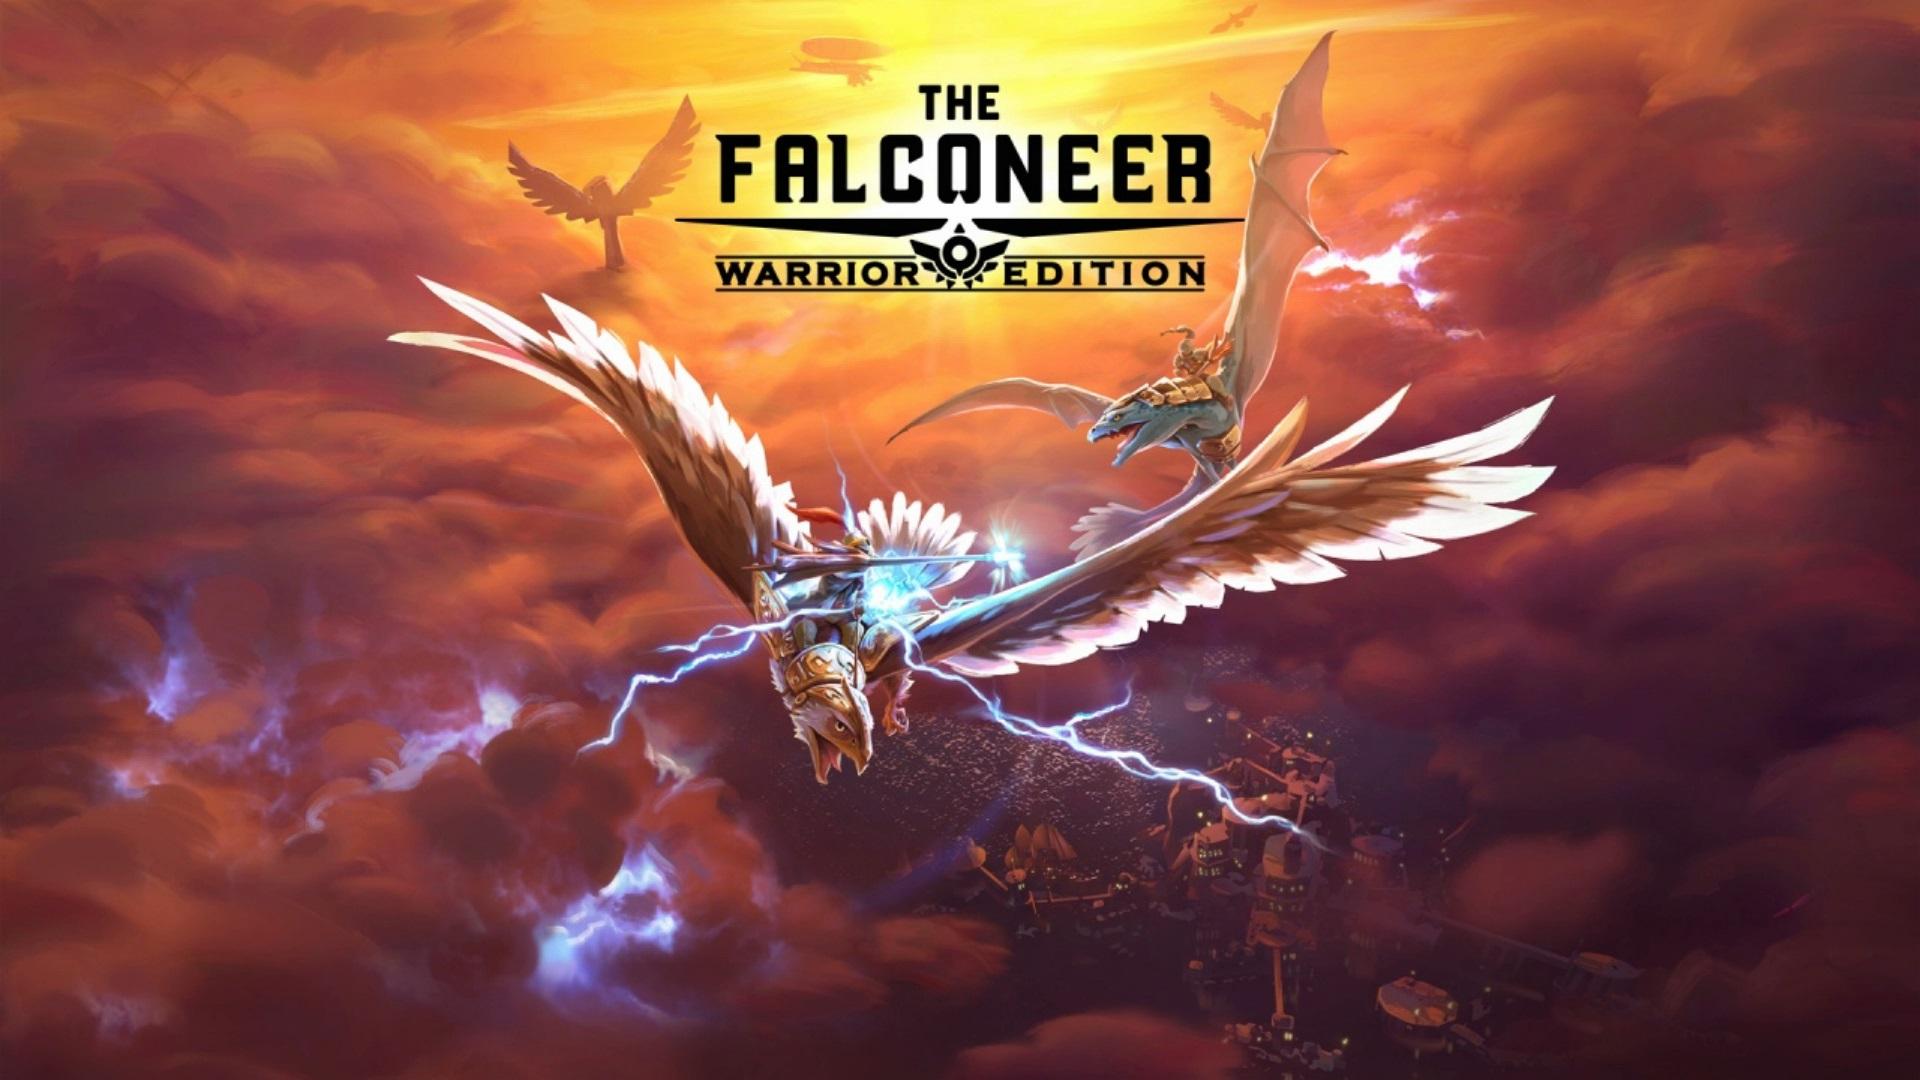 The Falconeer game